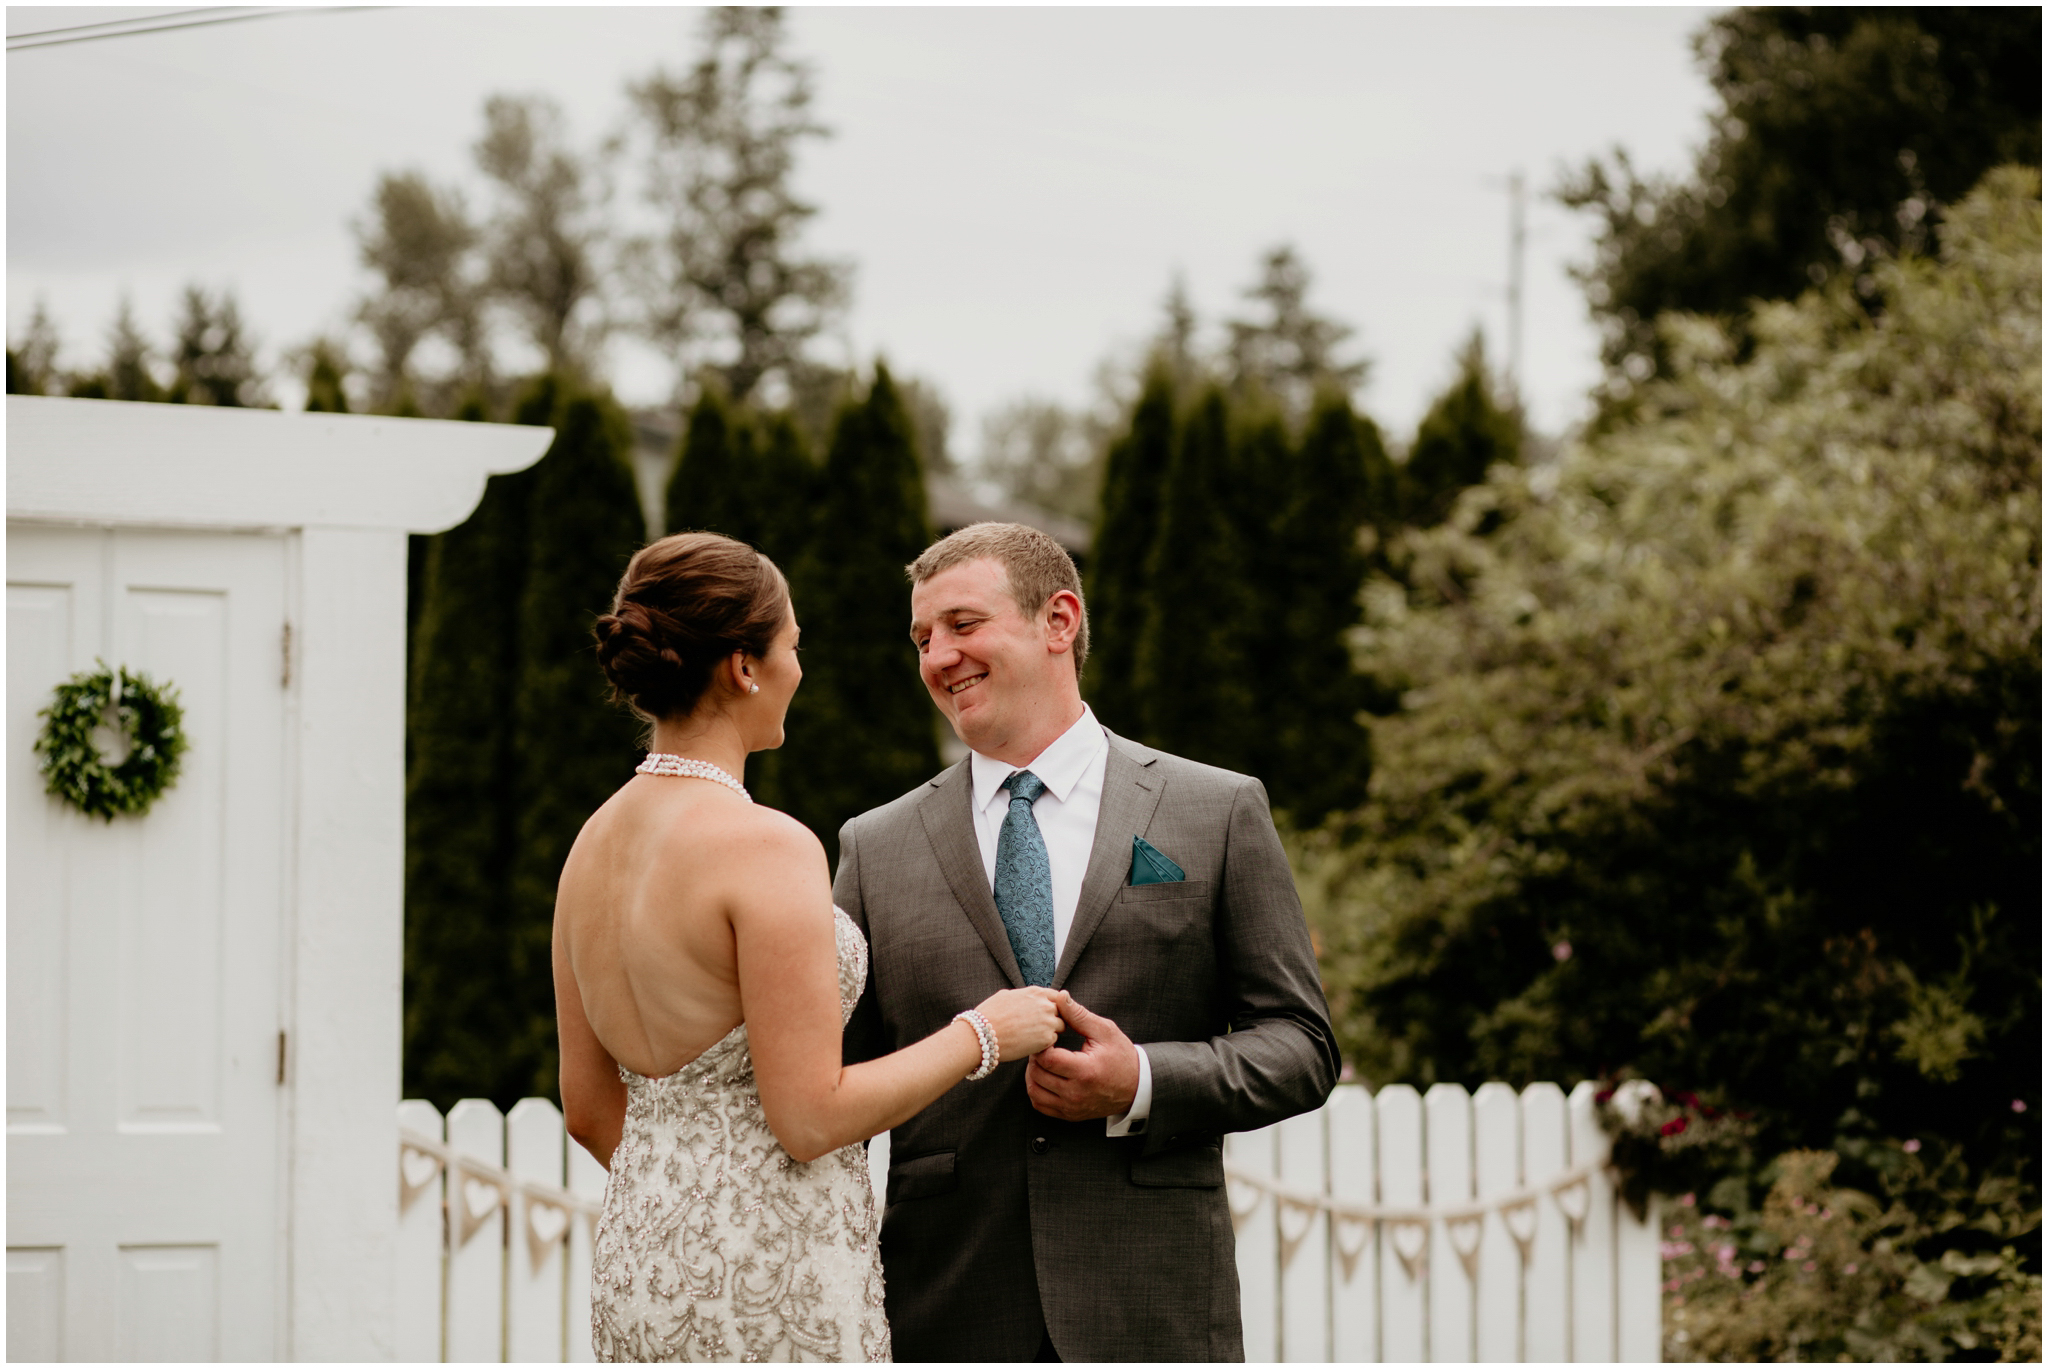 alex-and-matthew-three-cs-farm-venue-seattle-wedding-photographer-037.jpg